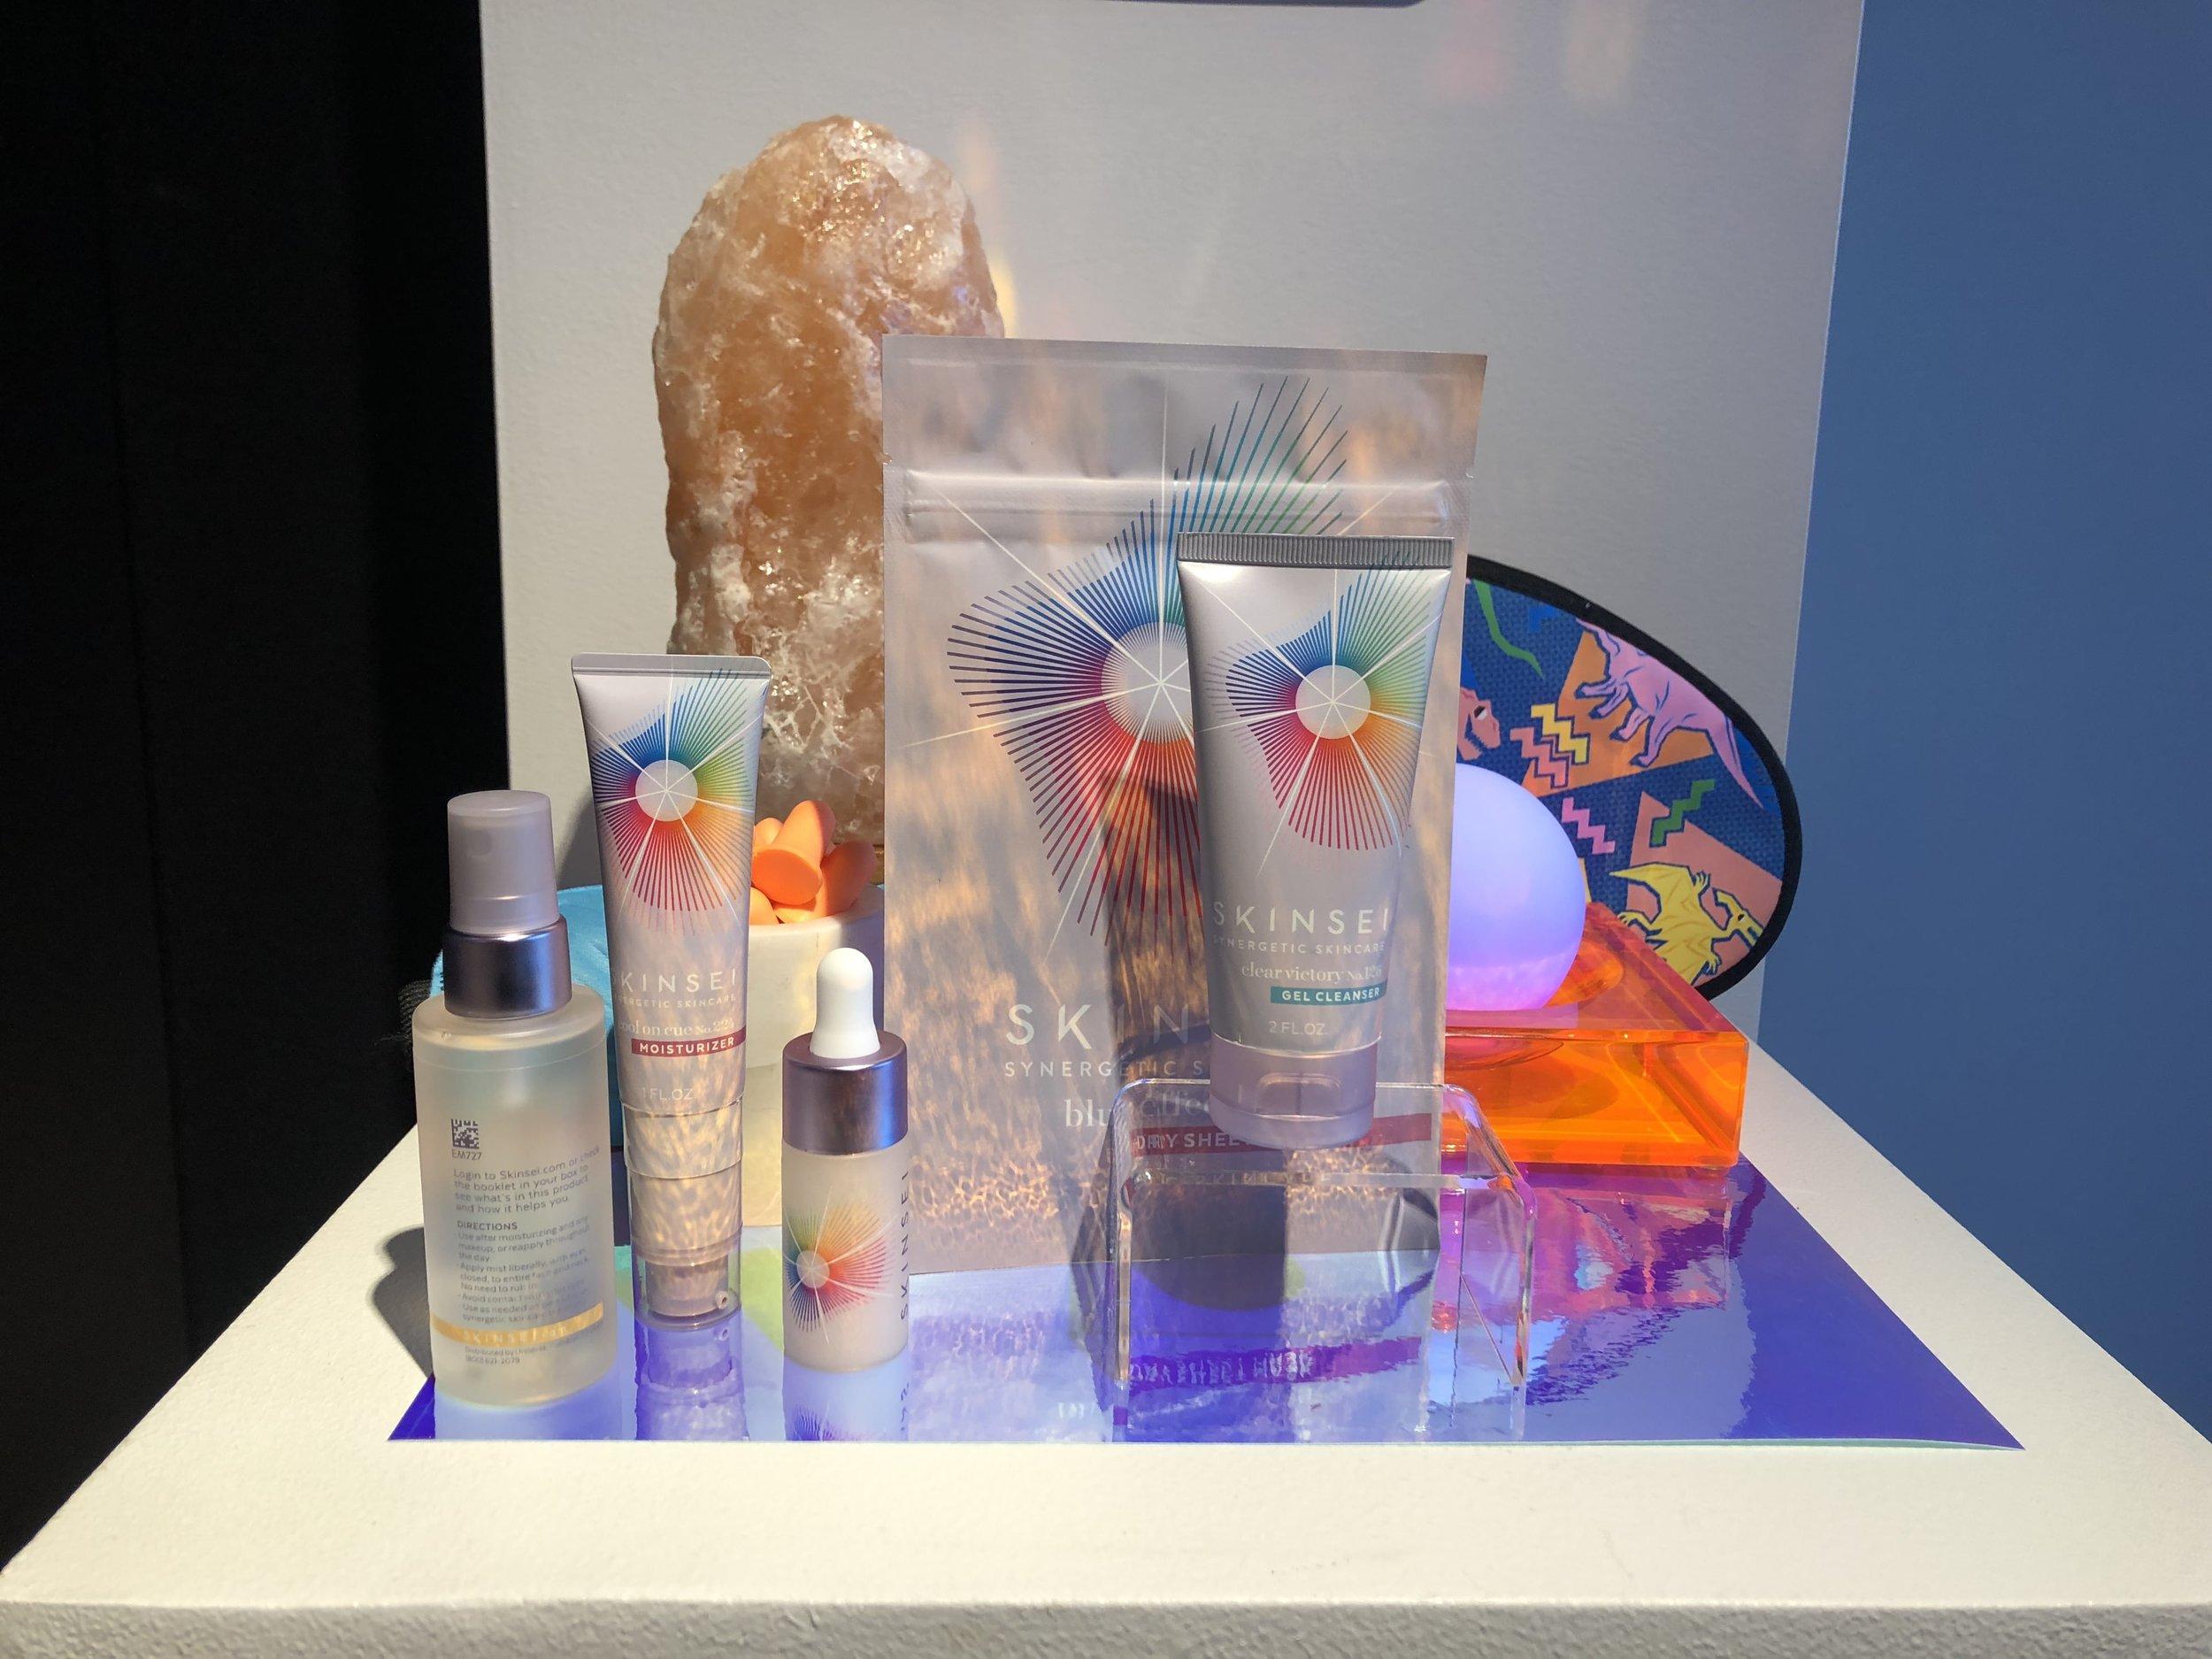 Skinsei Pink Salt Product Display- B Floral